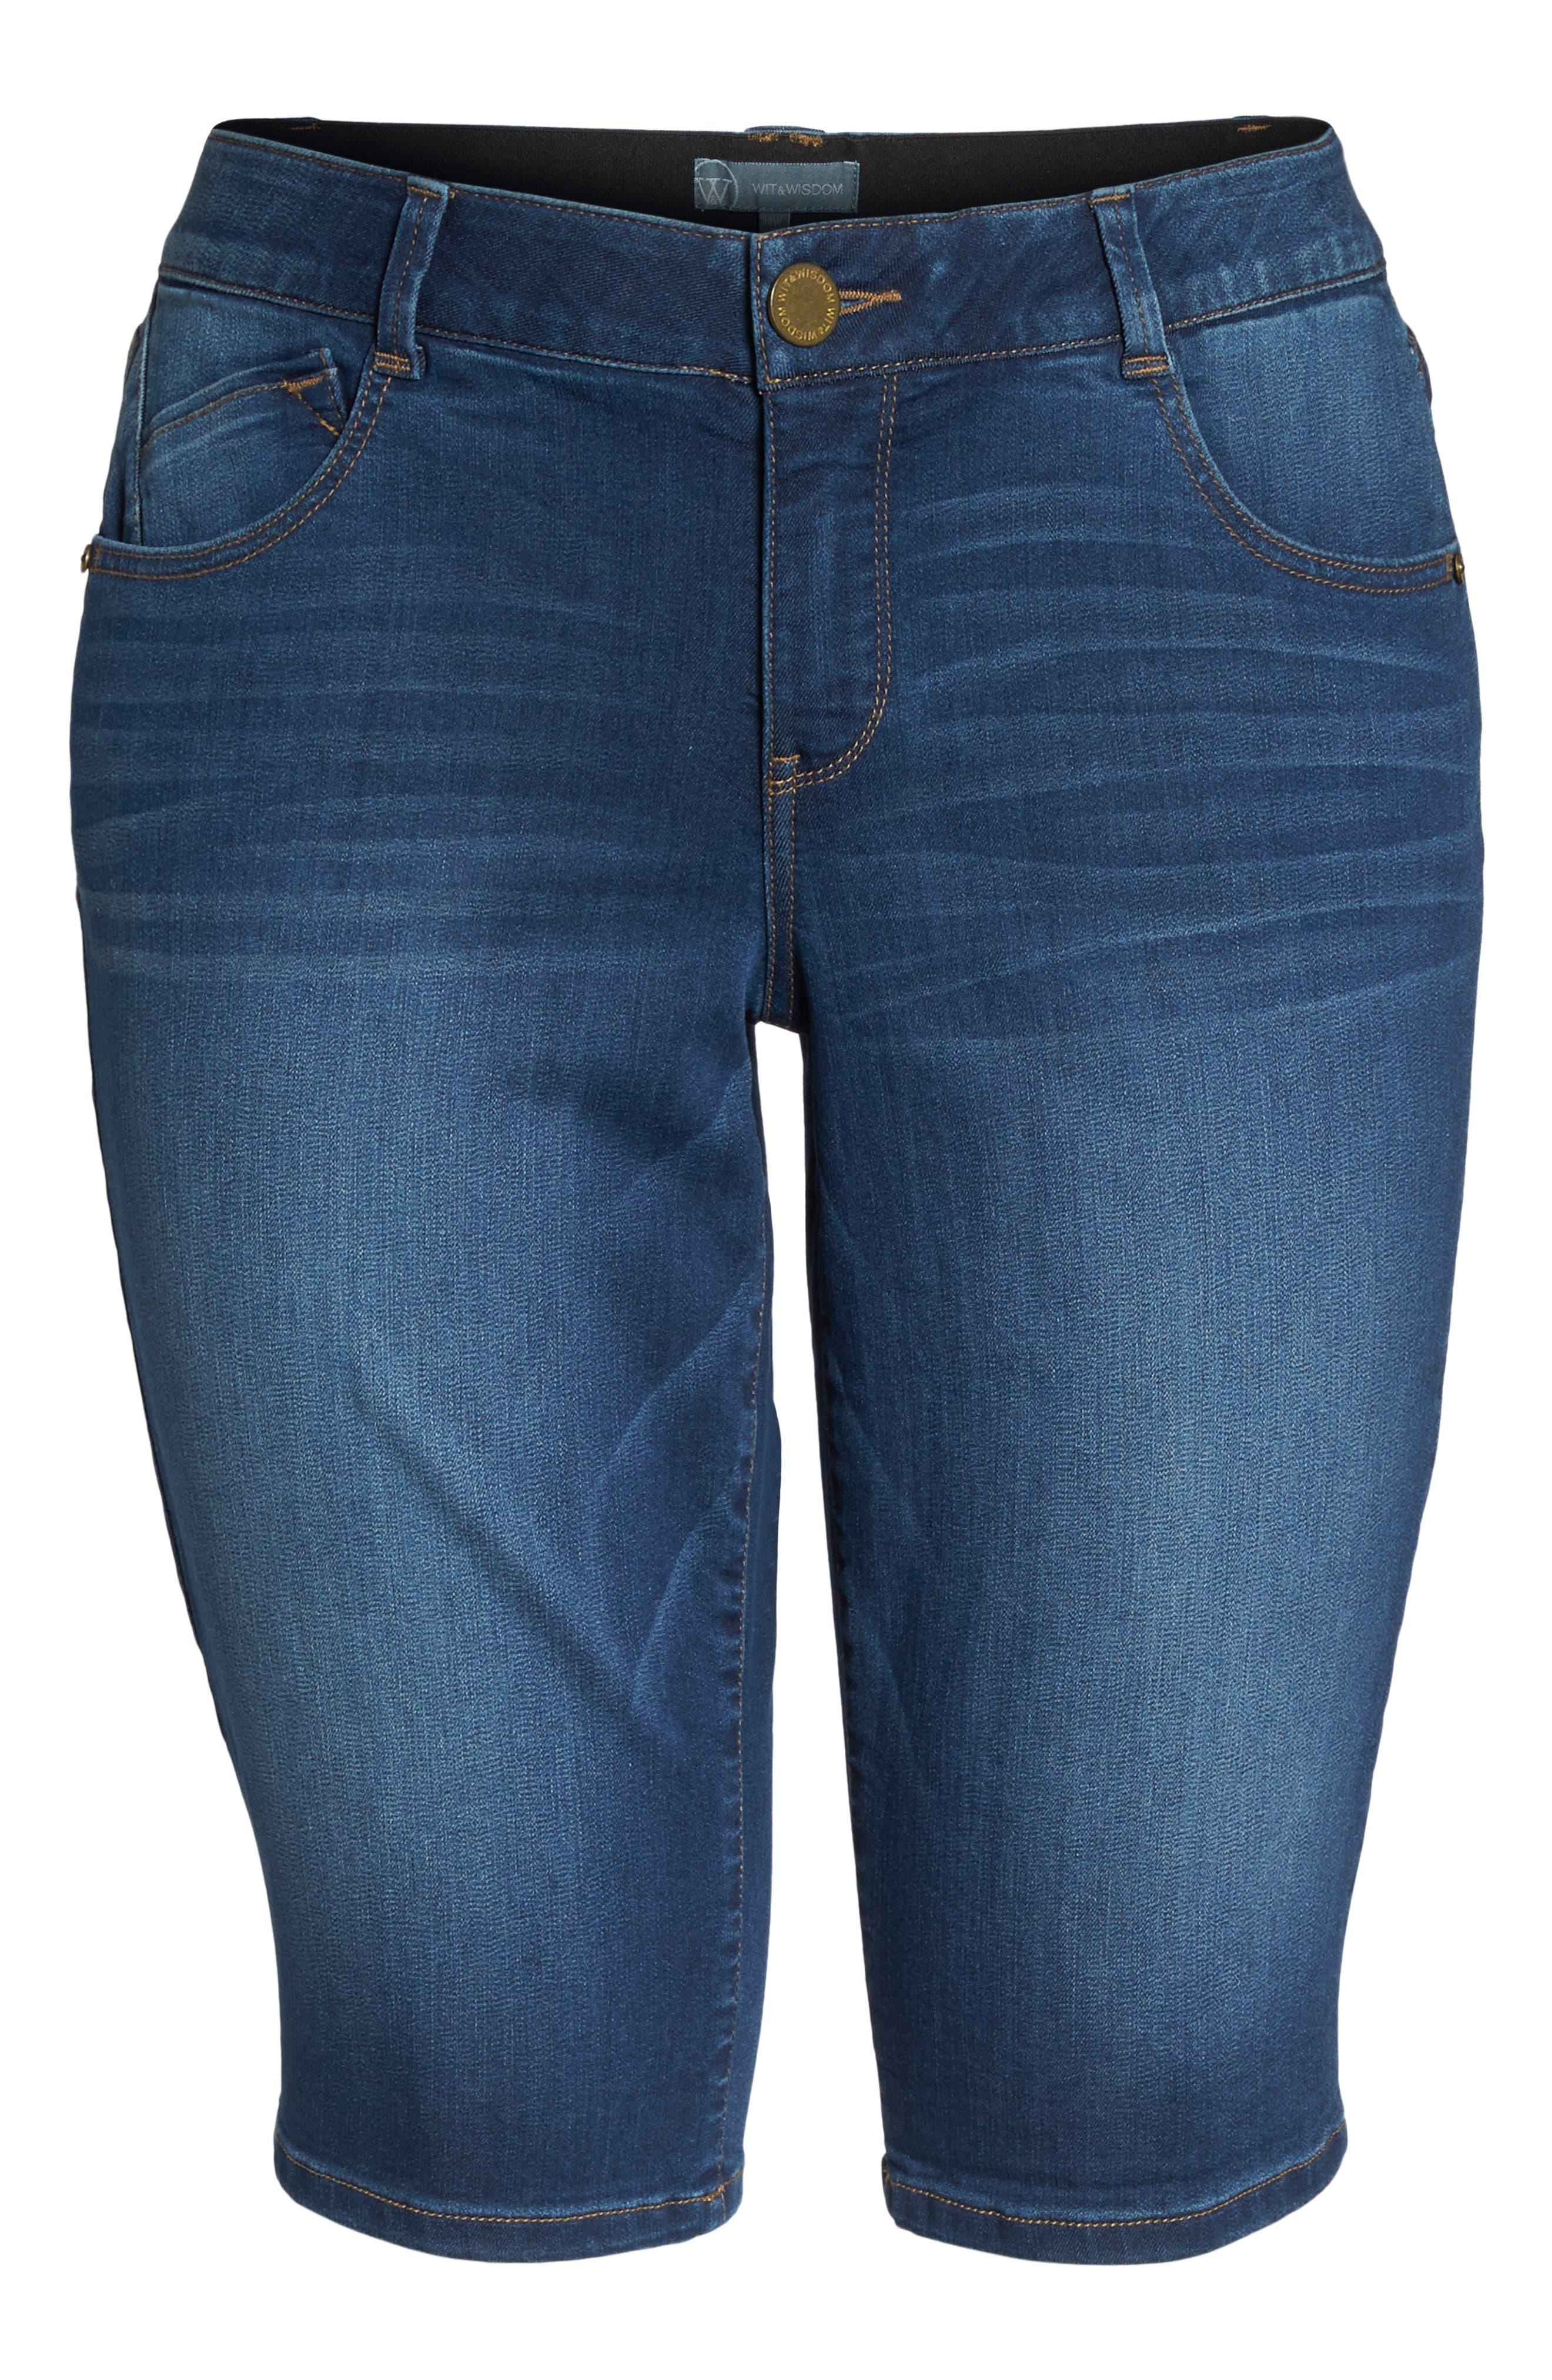 Ab-solution Denim Bermuda Shorts,                             Alternate thumbnail 7, color,                             Blue